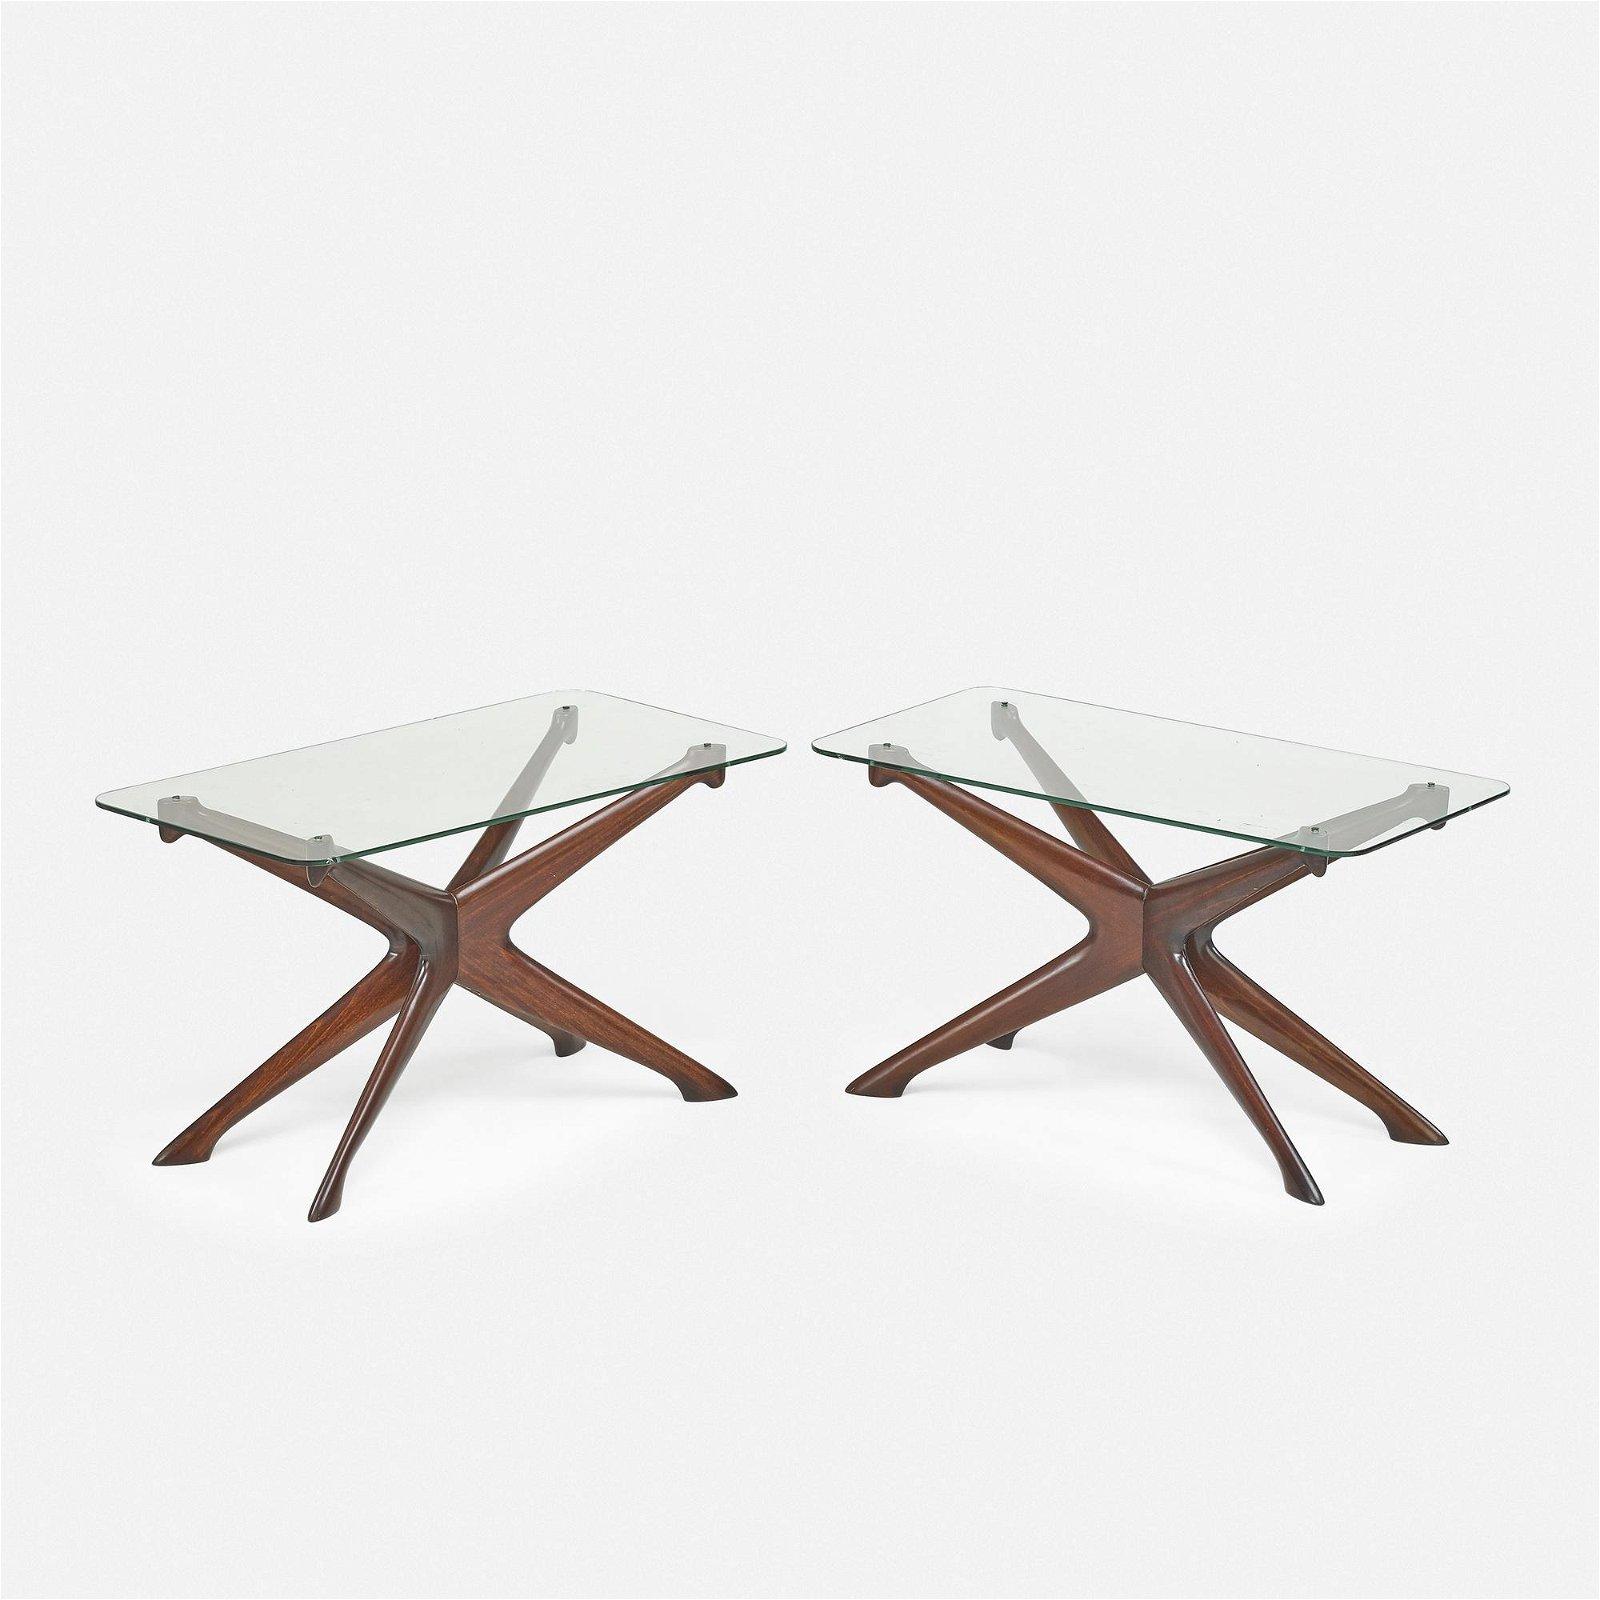 Ico and Luisa Parisi, attribution, tables